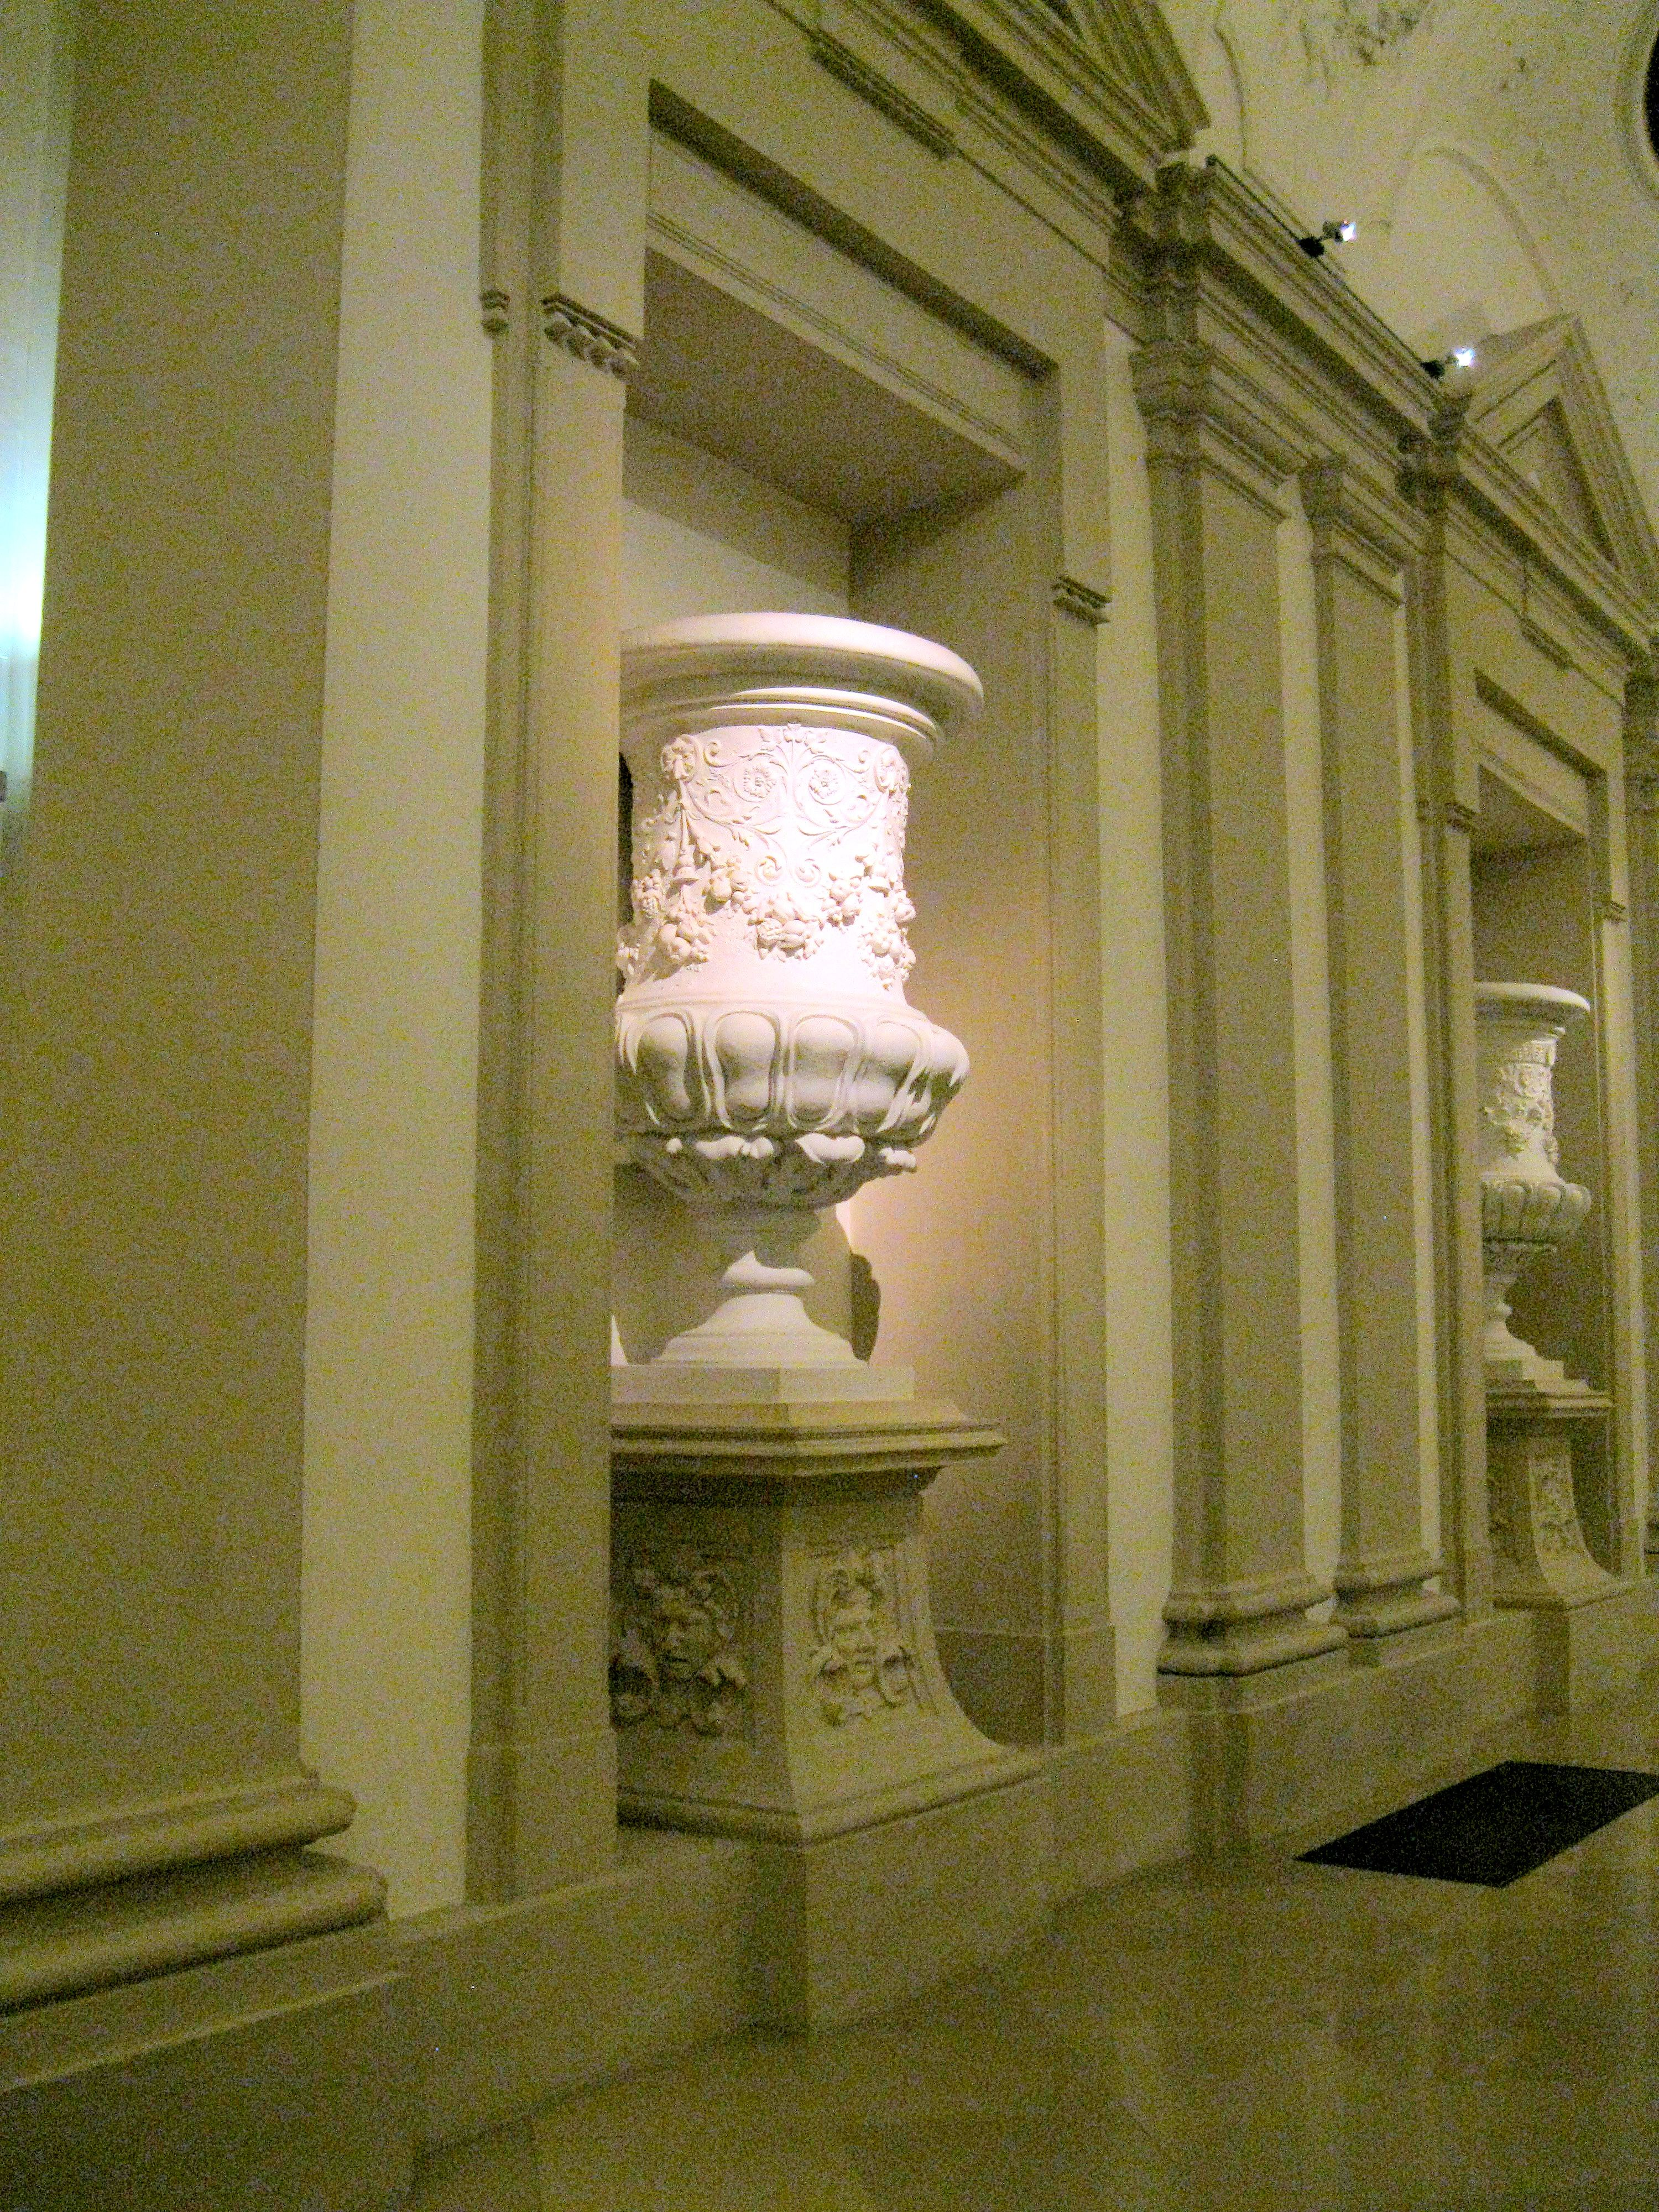 Iconic sculptures luxurytravelboutiqueuiseholidays